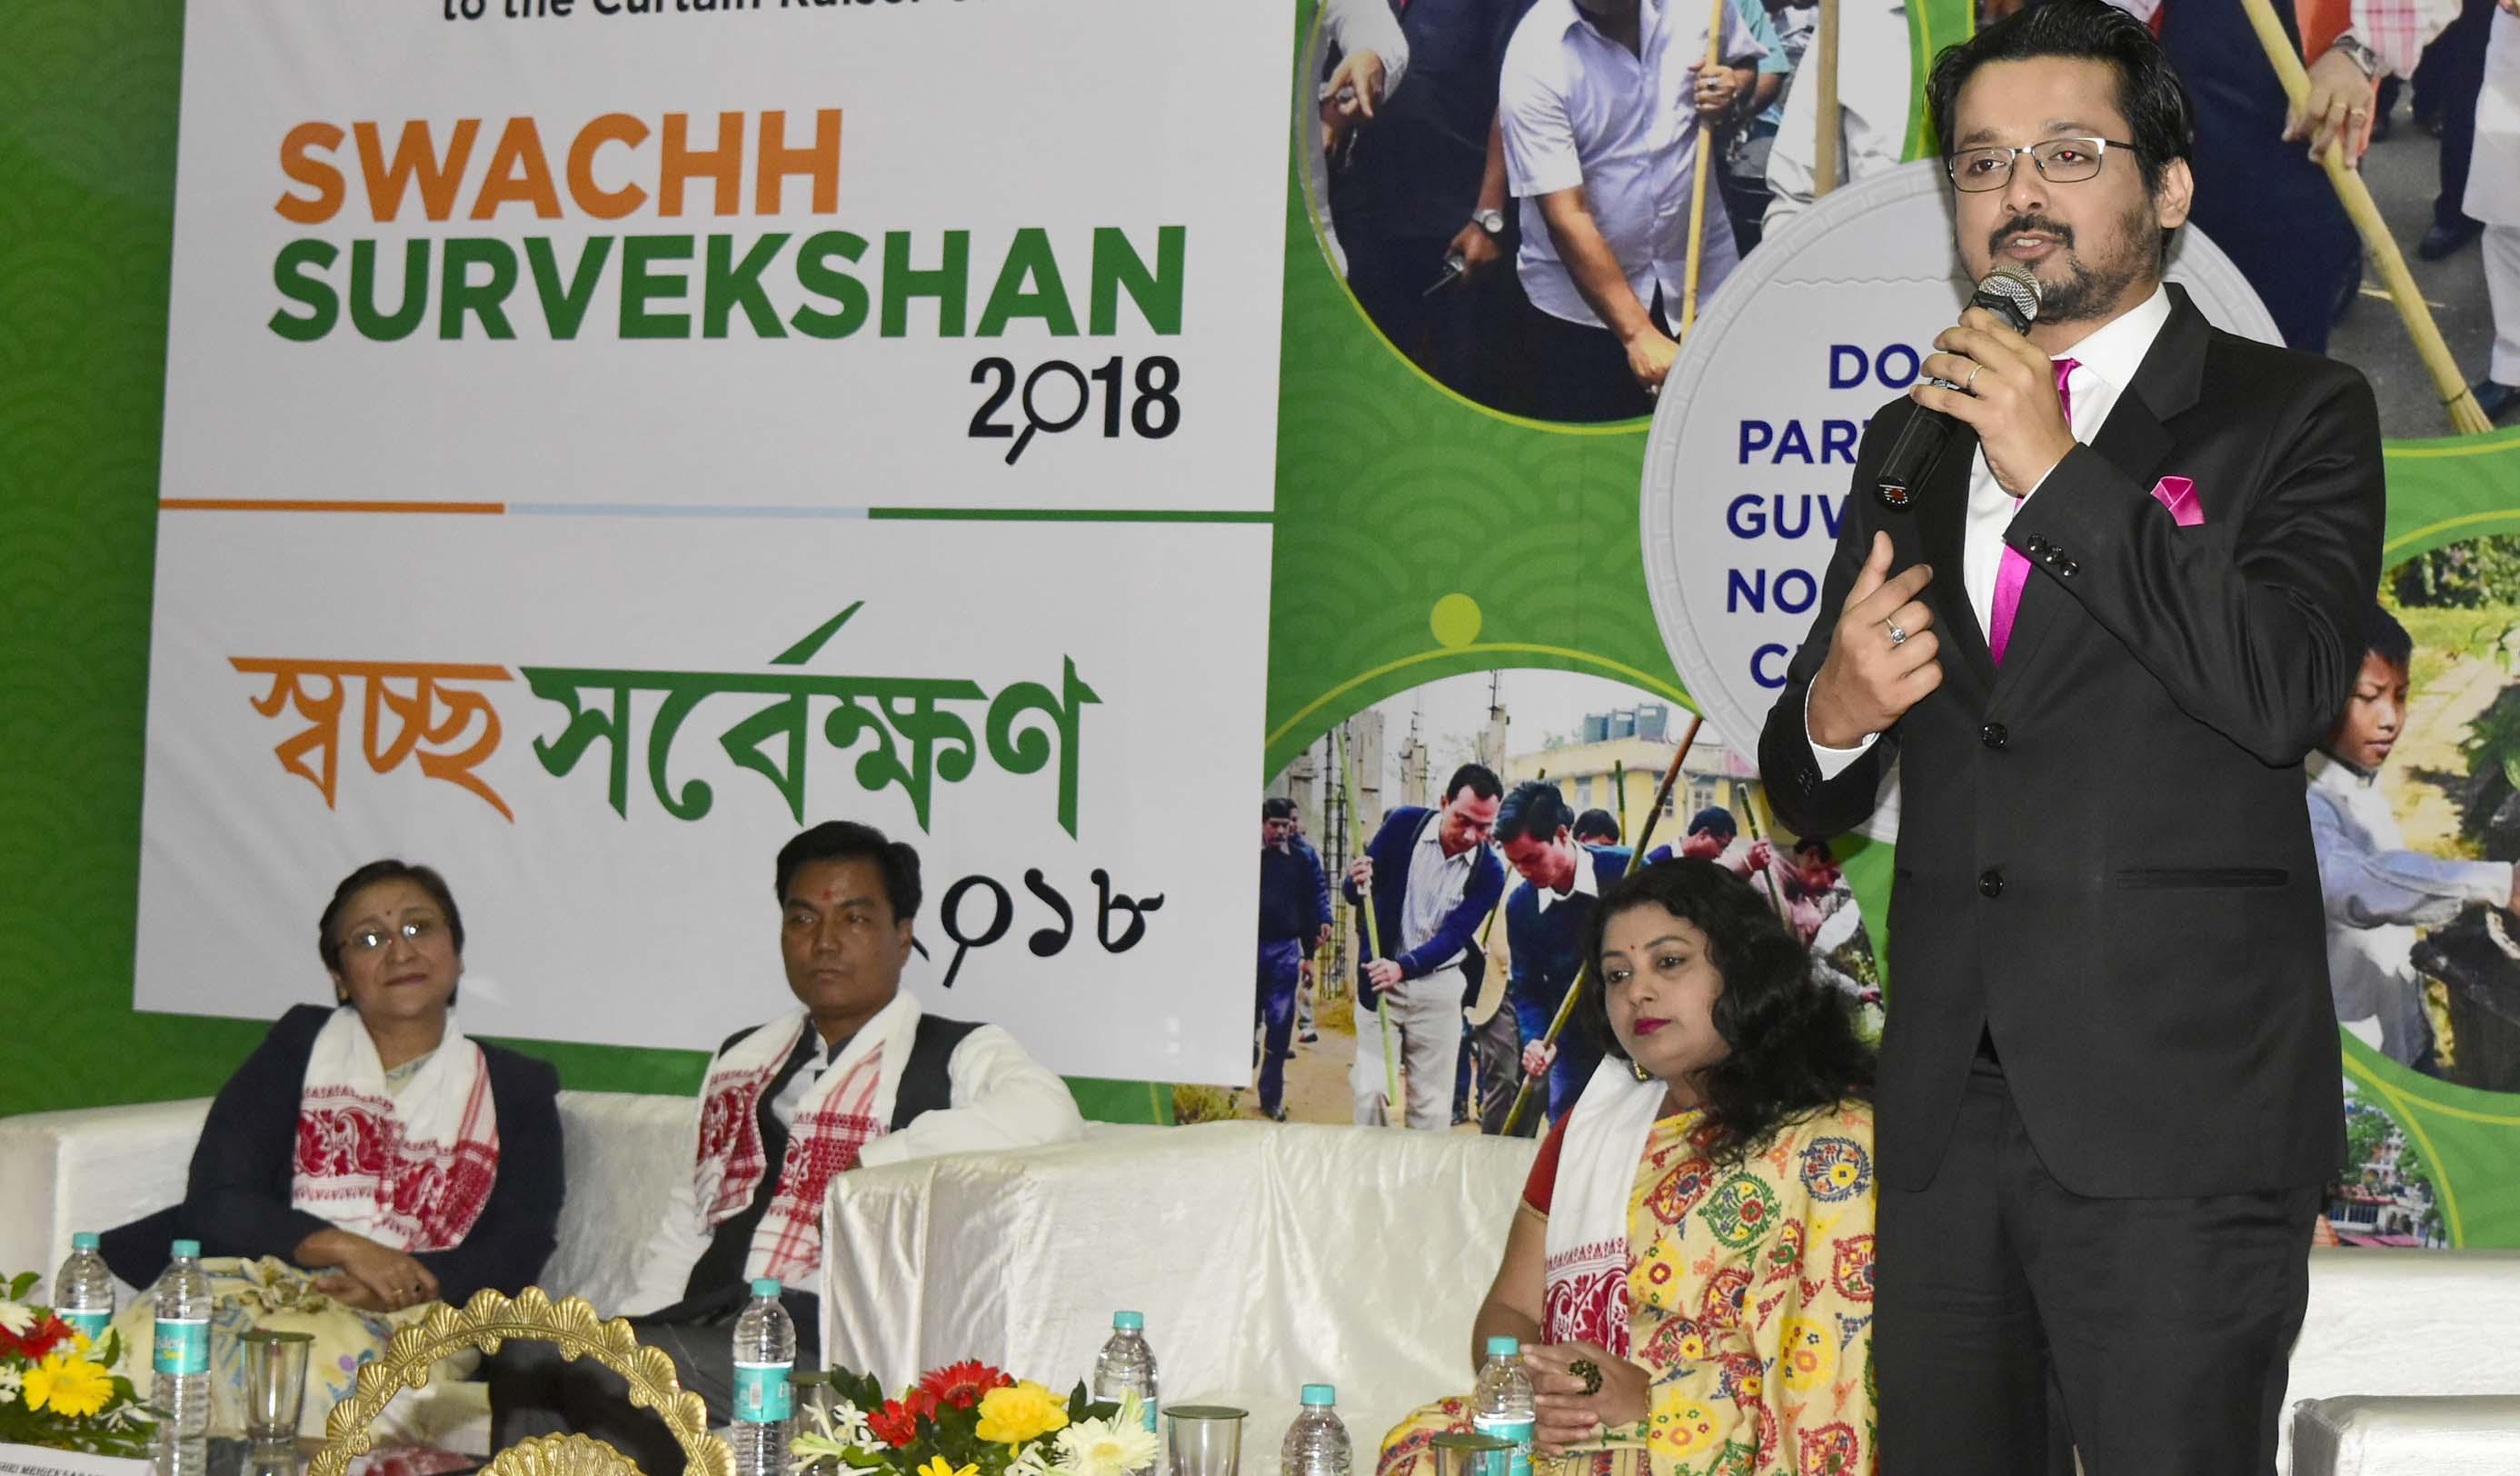 Swachh Survekshan